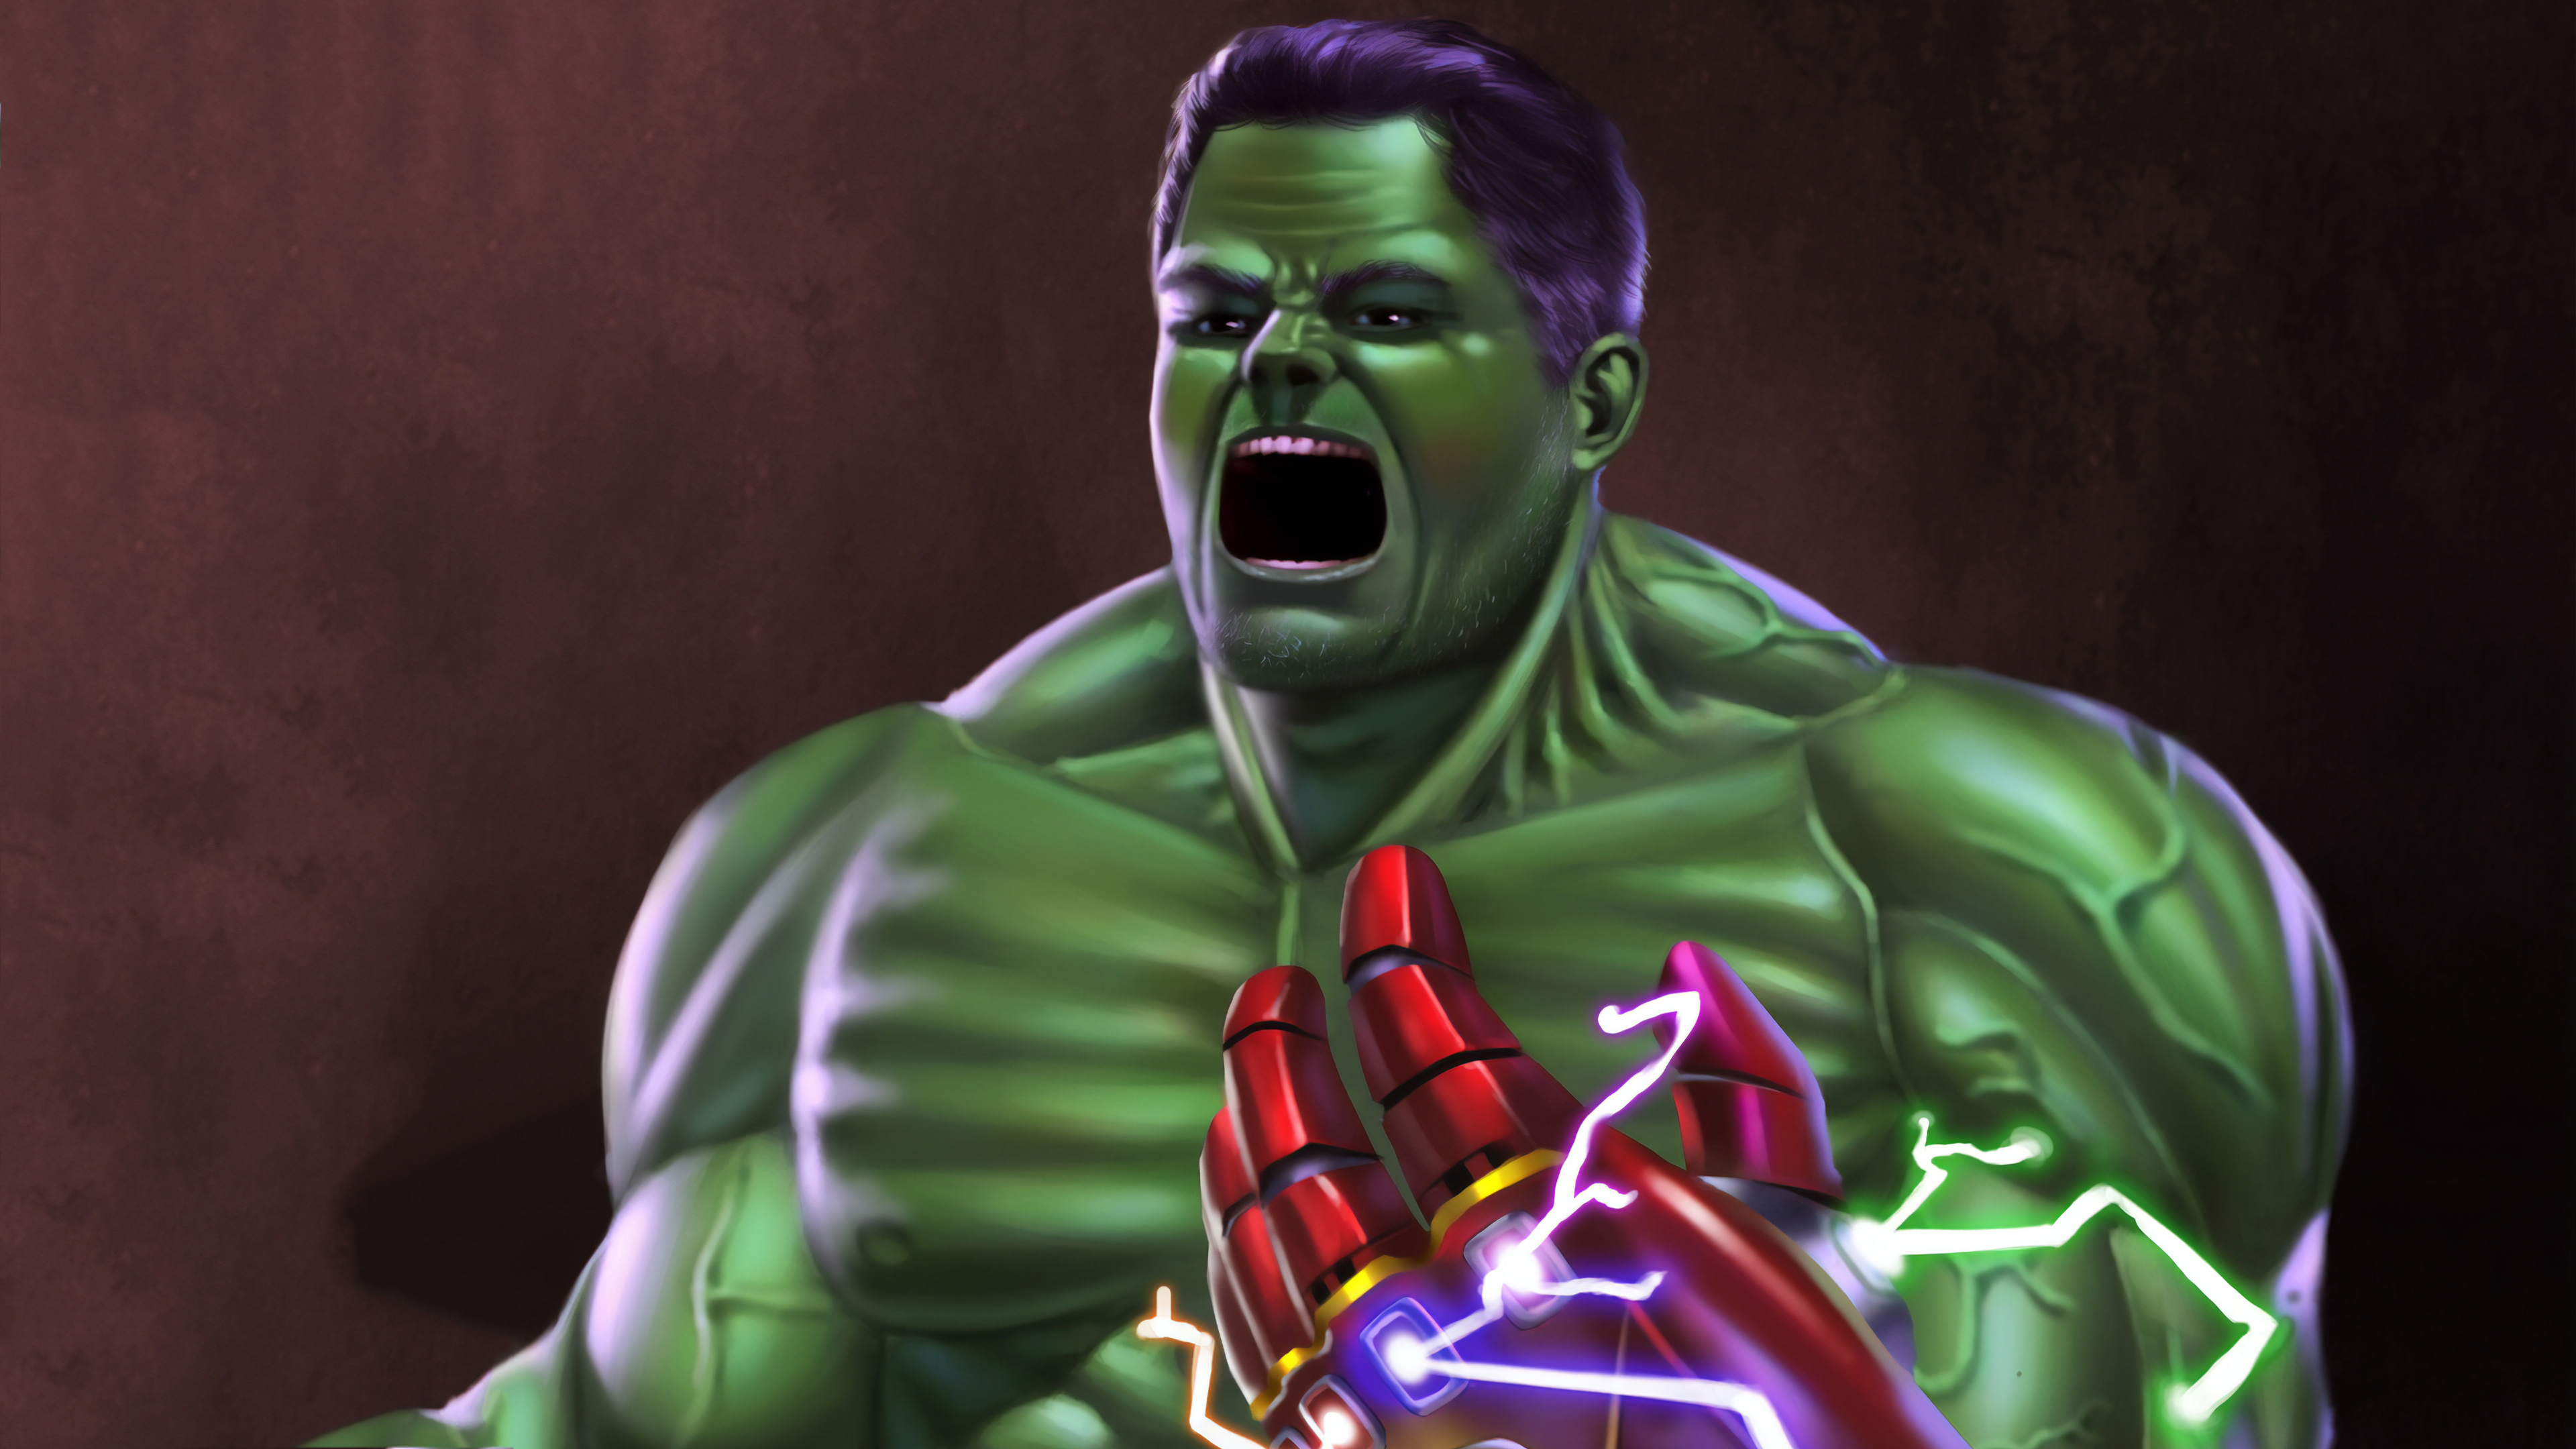 Wallpaper 4k Hulk Infinity Gauntlet 4k Wallpapers Artwork